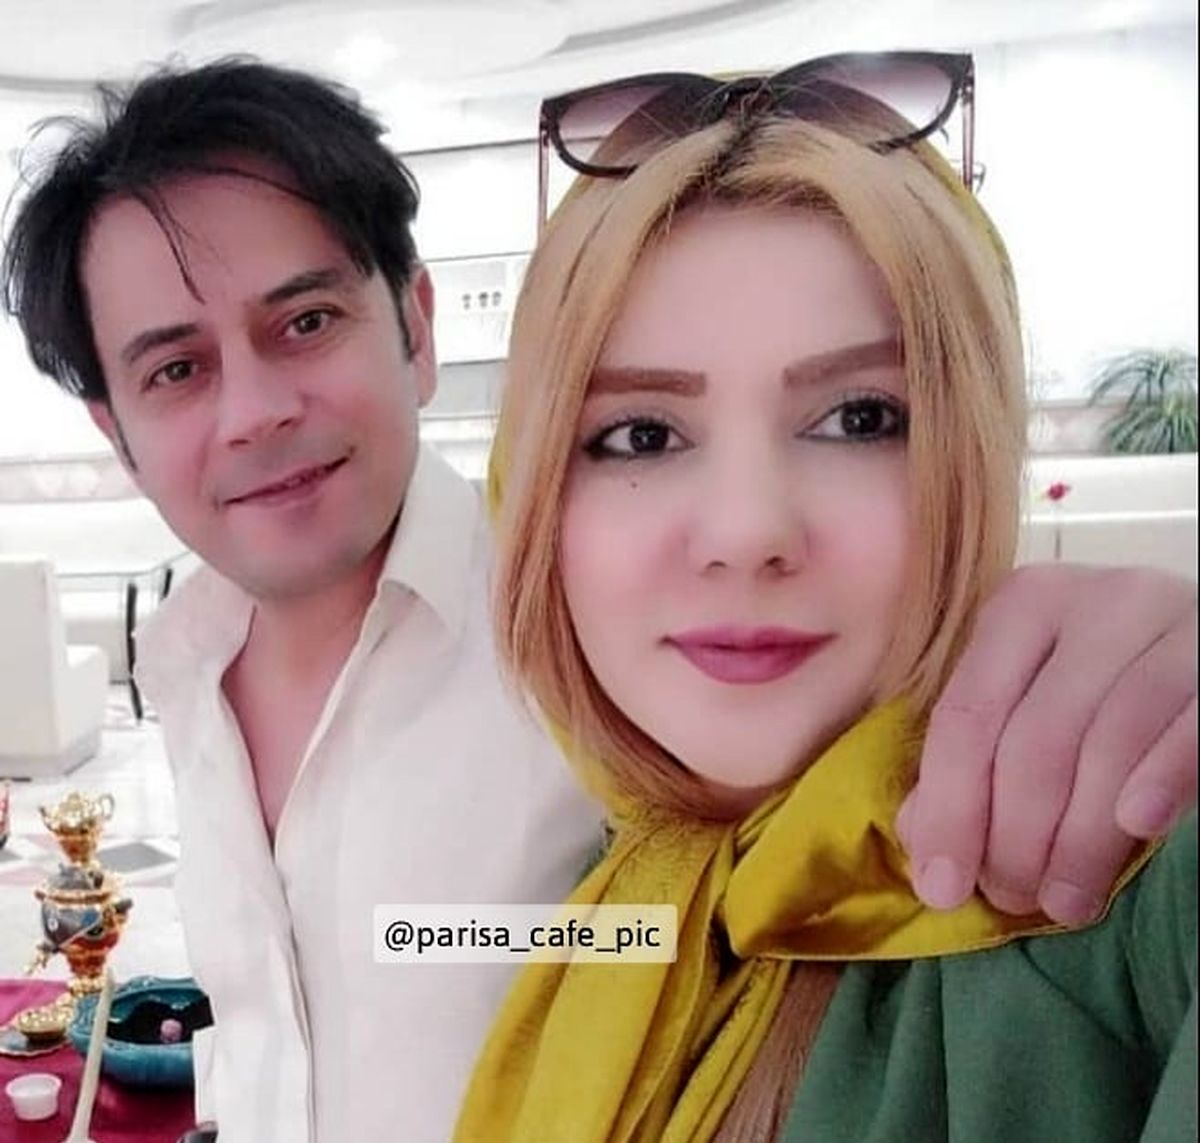 زن سوم رحیم نوروزی و علت طلاق از همسر سابقش! +عکس